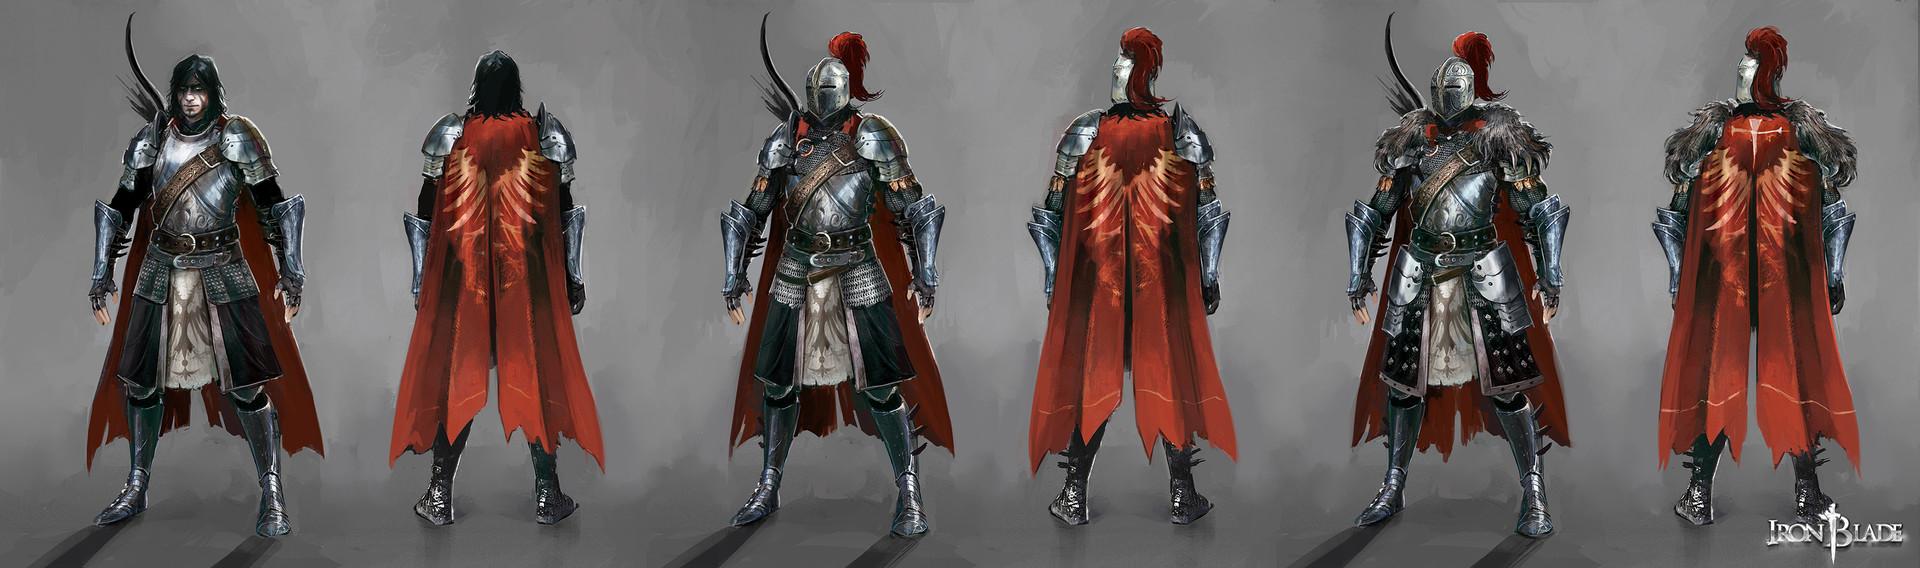 Alexandre chaudret hf armorset armors02